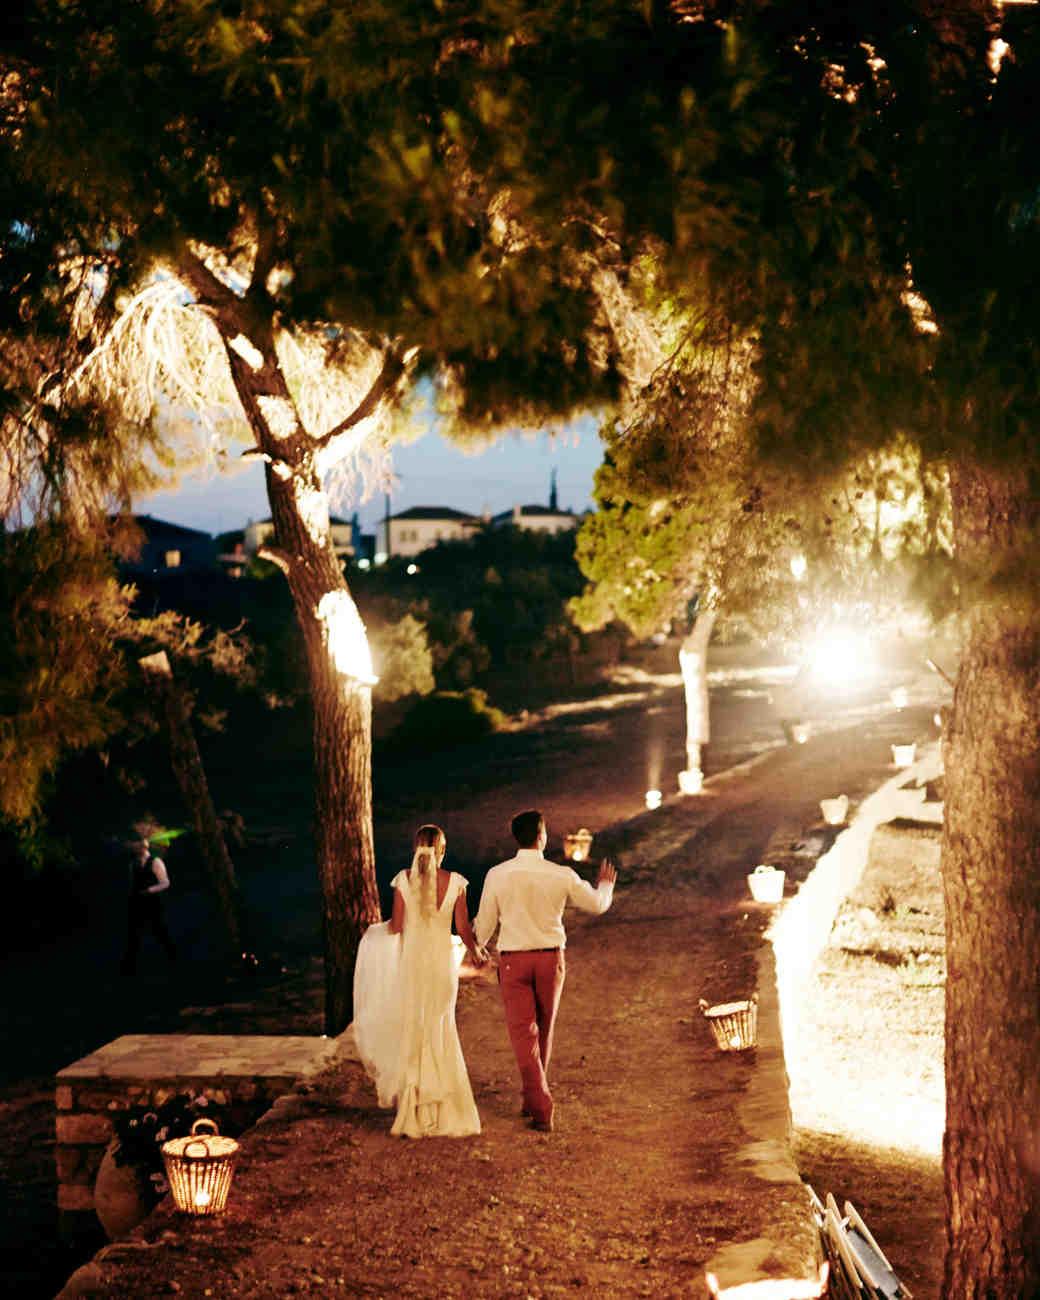 ana-alden-wedding-greece-611a5034-s111821.jpg